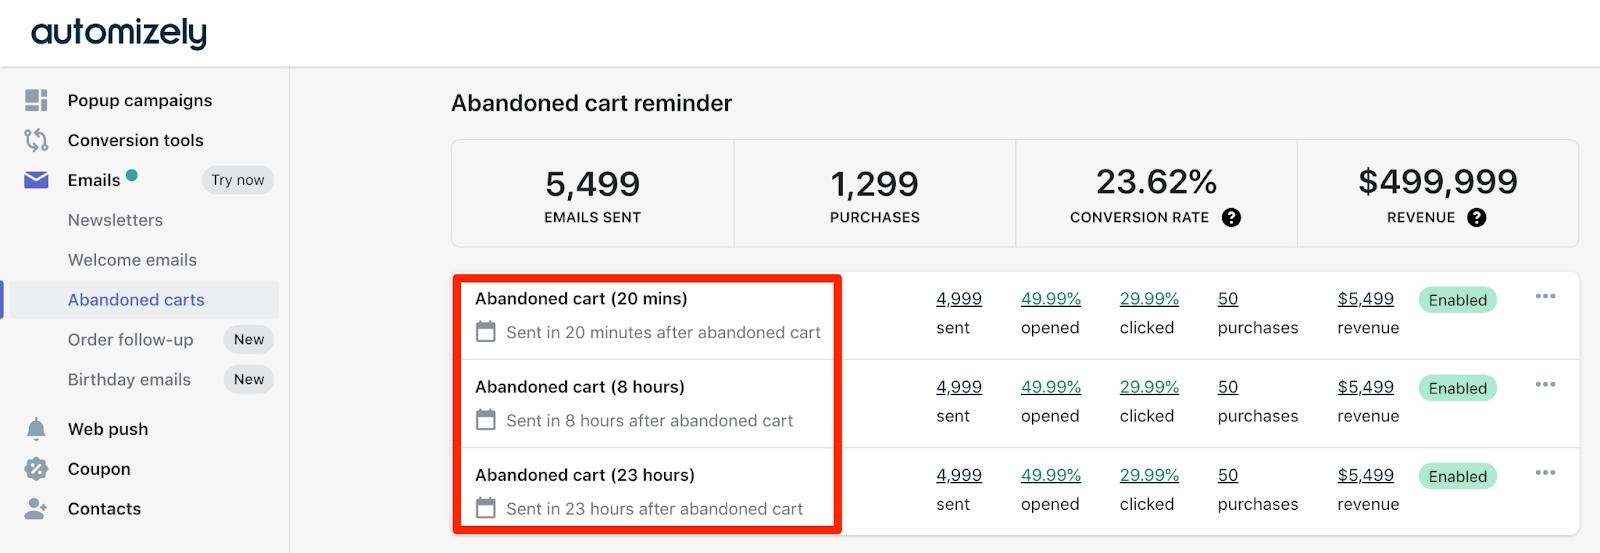 Best Shopify Email Marketing App 2021: Automizely Marketing